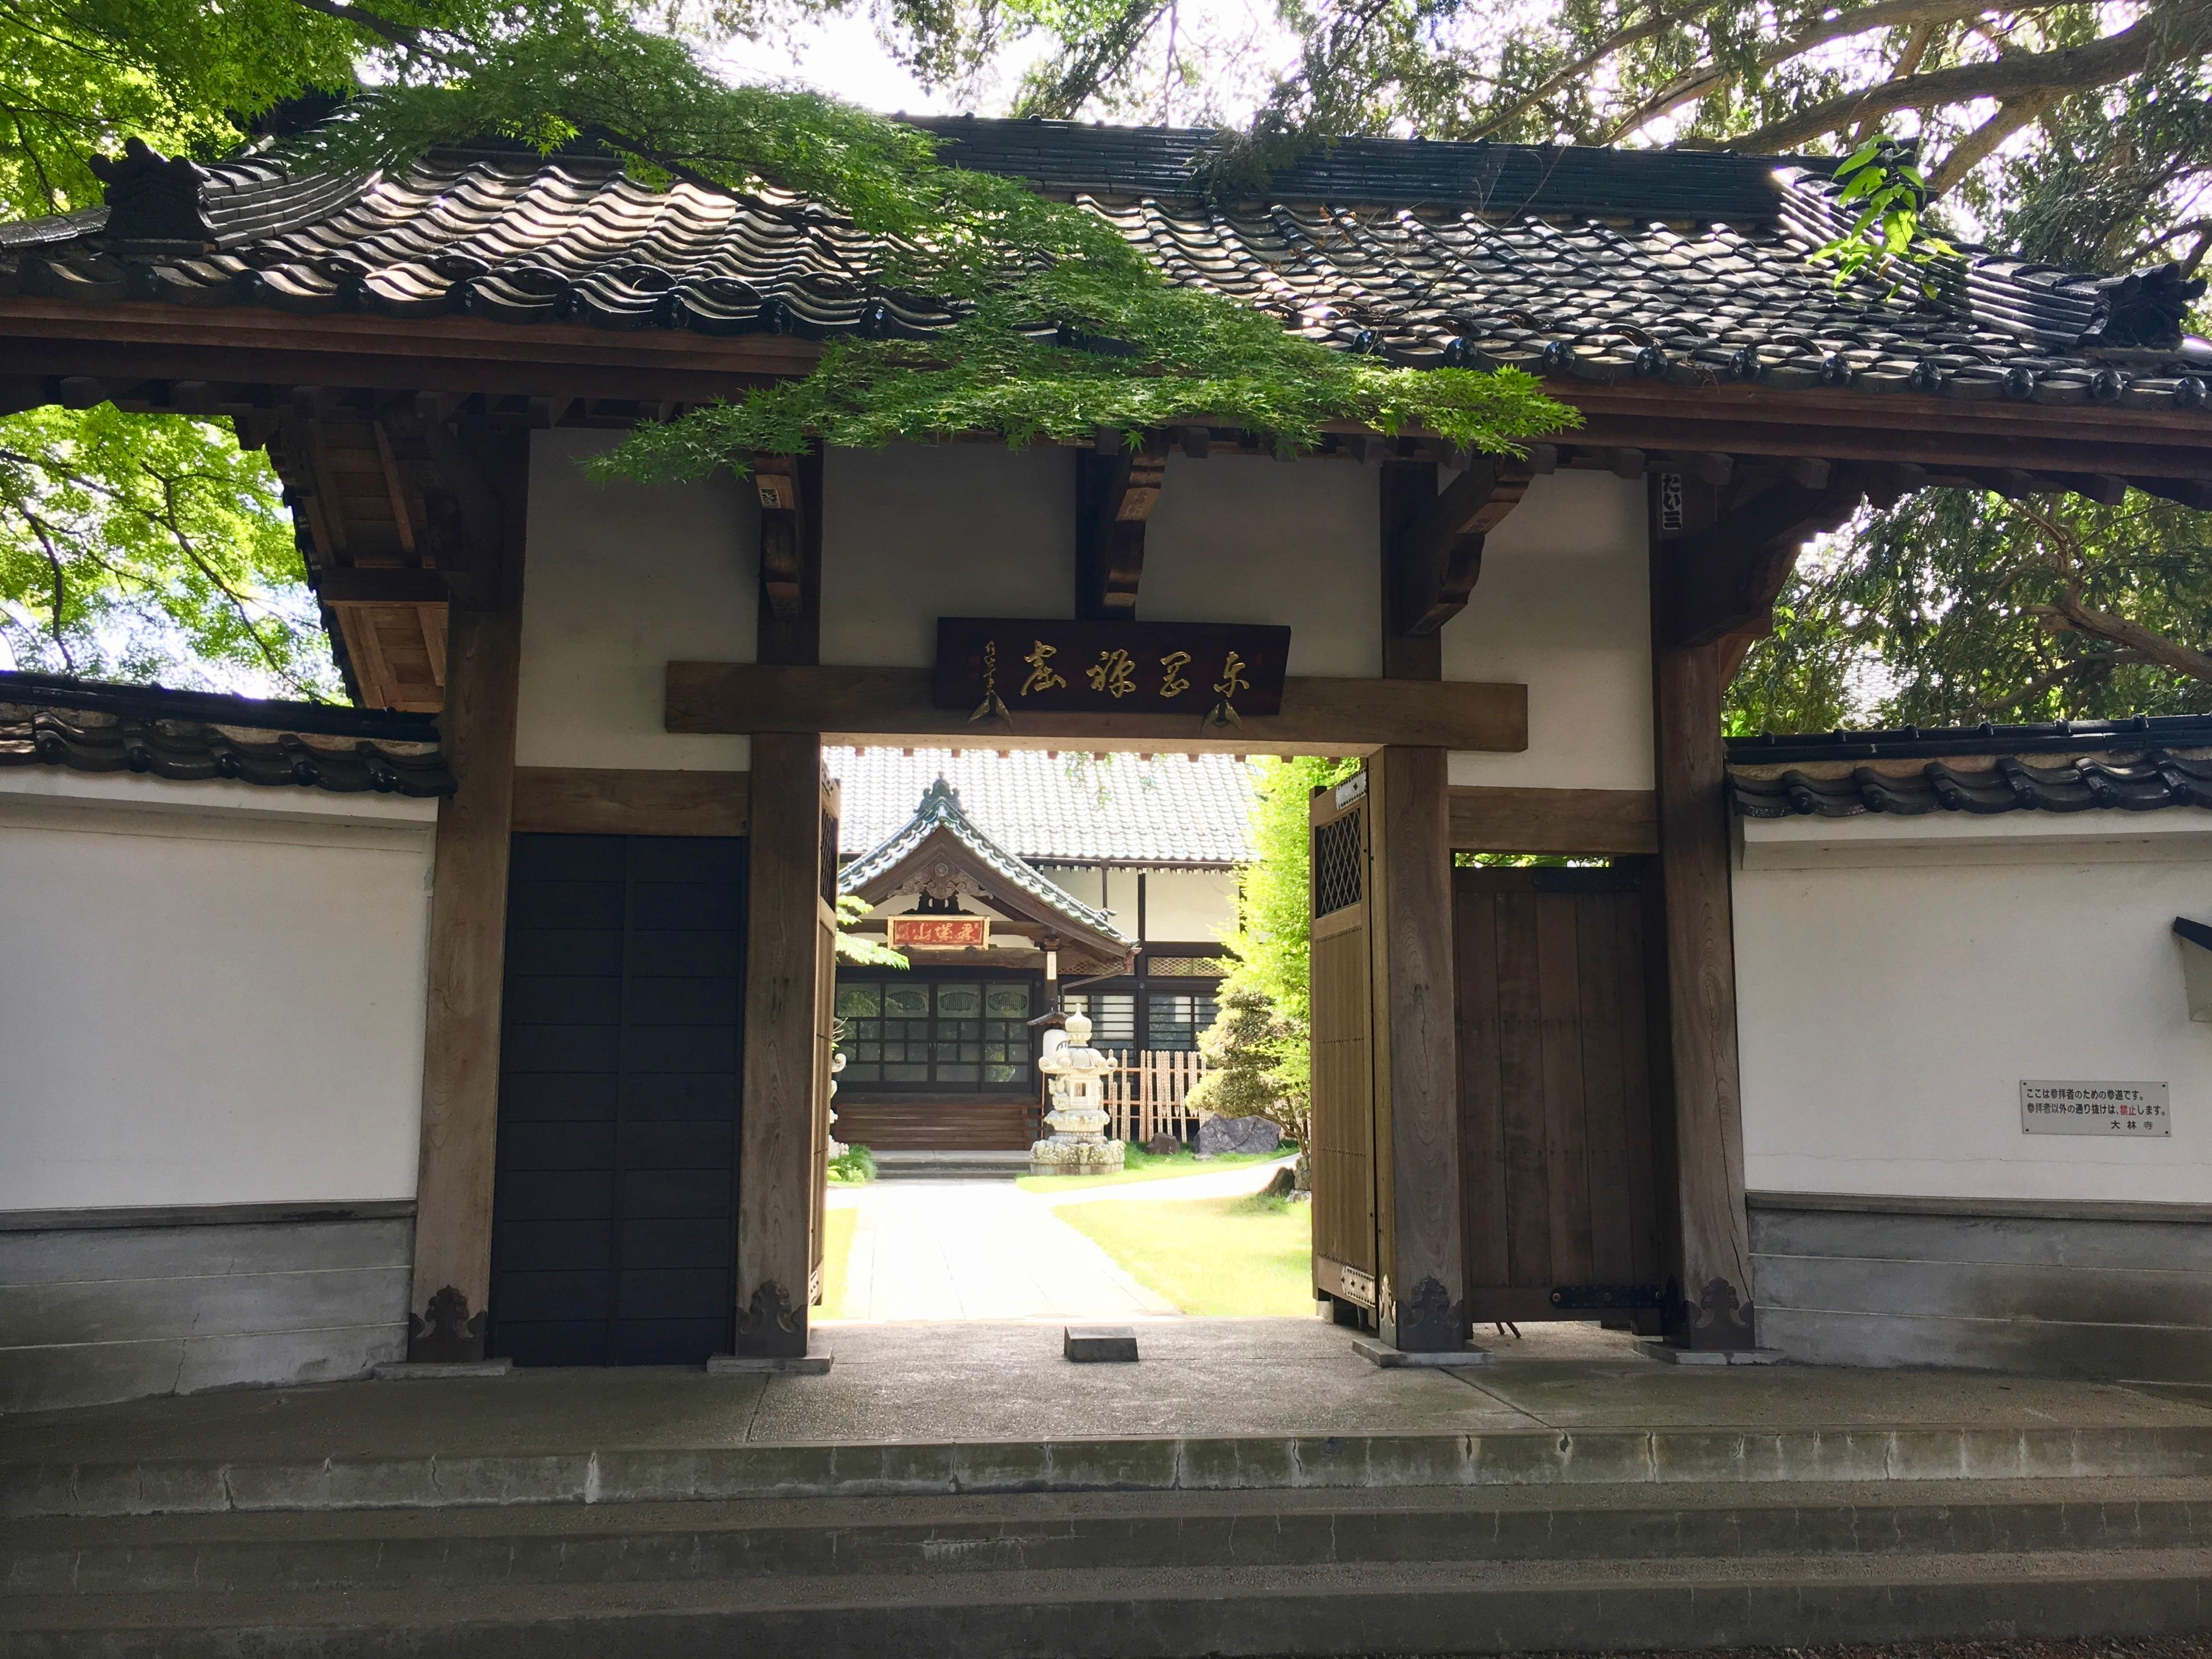 大林寺の山門(宮城県榴ケ岡駅)